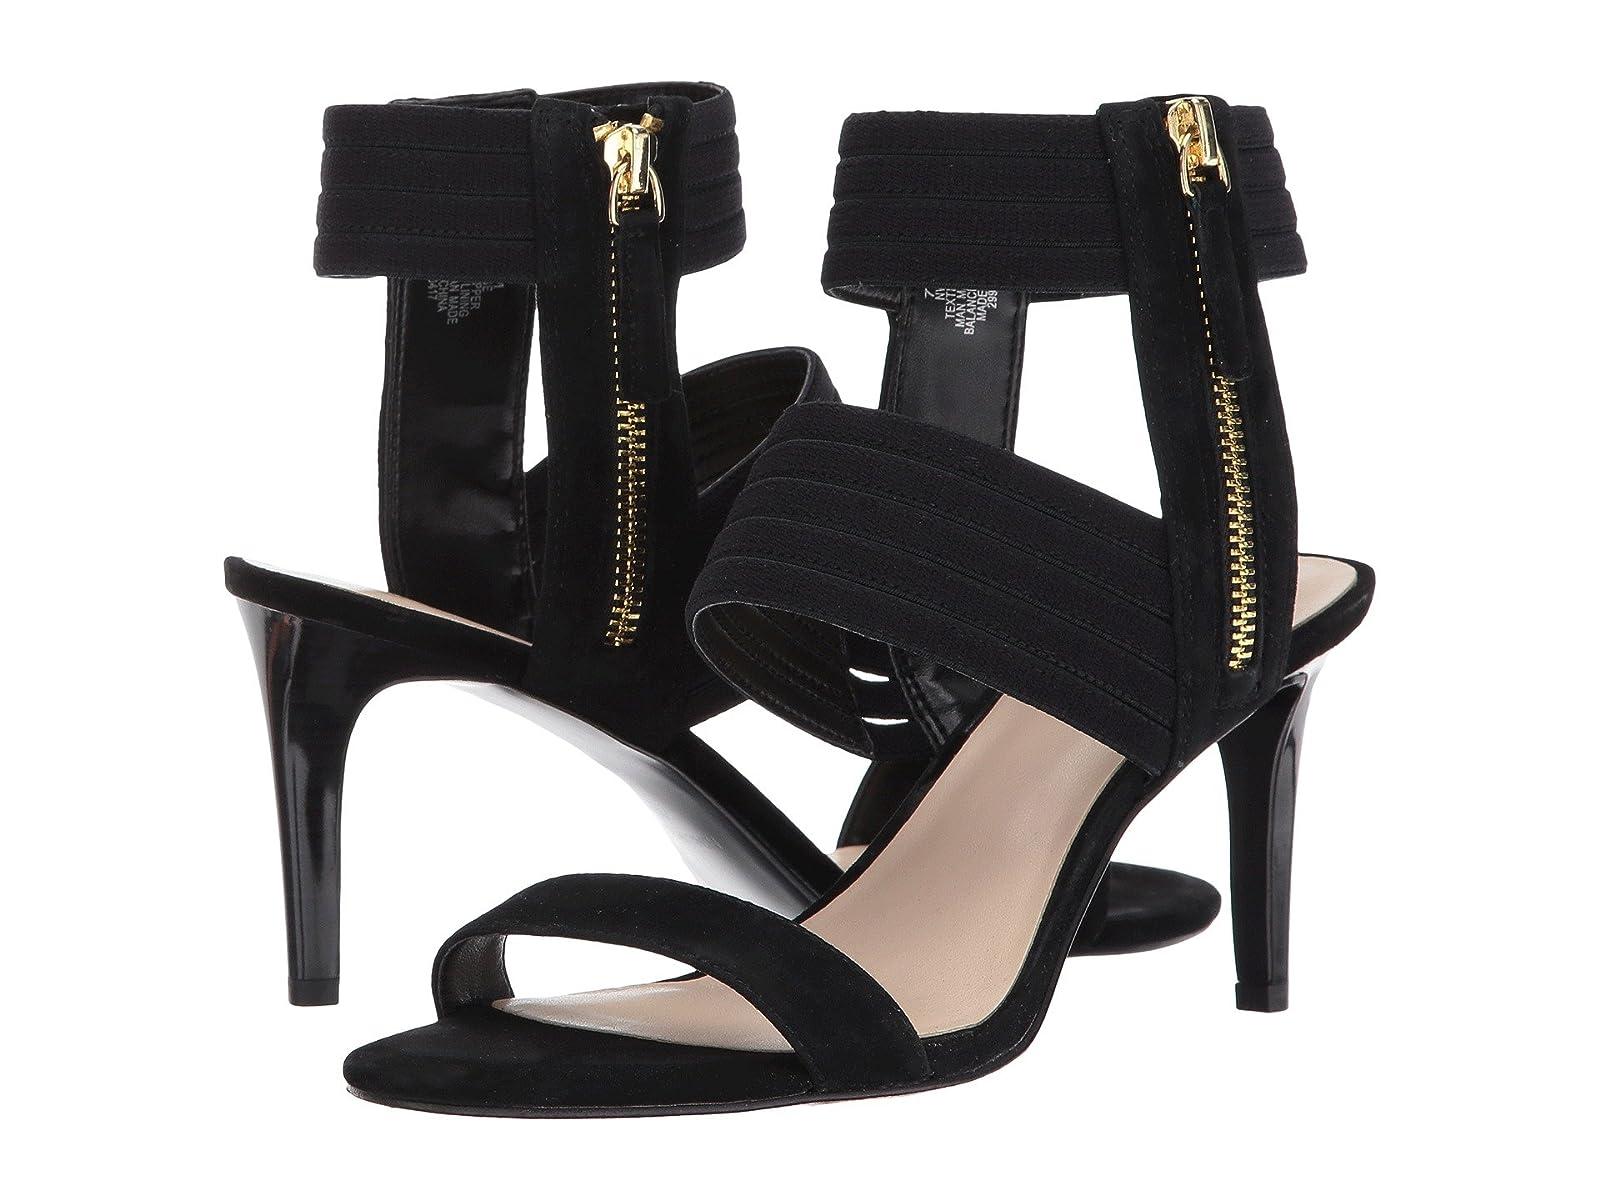 Nine West IlyseCheap and distinctive eye-catching shoes